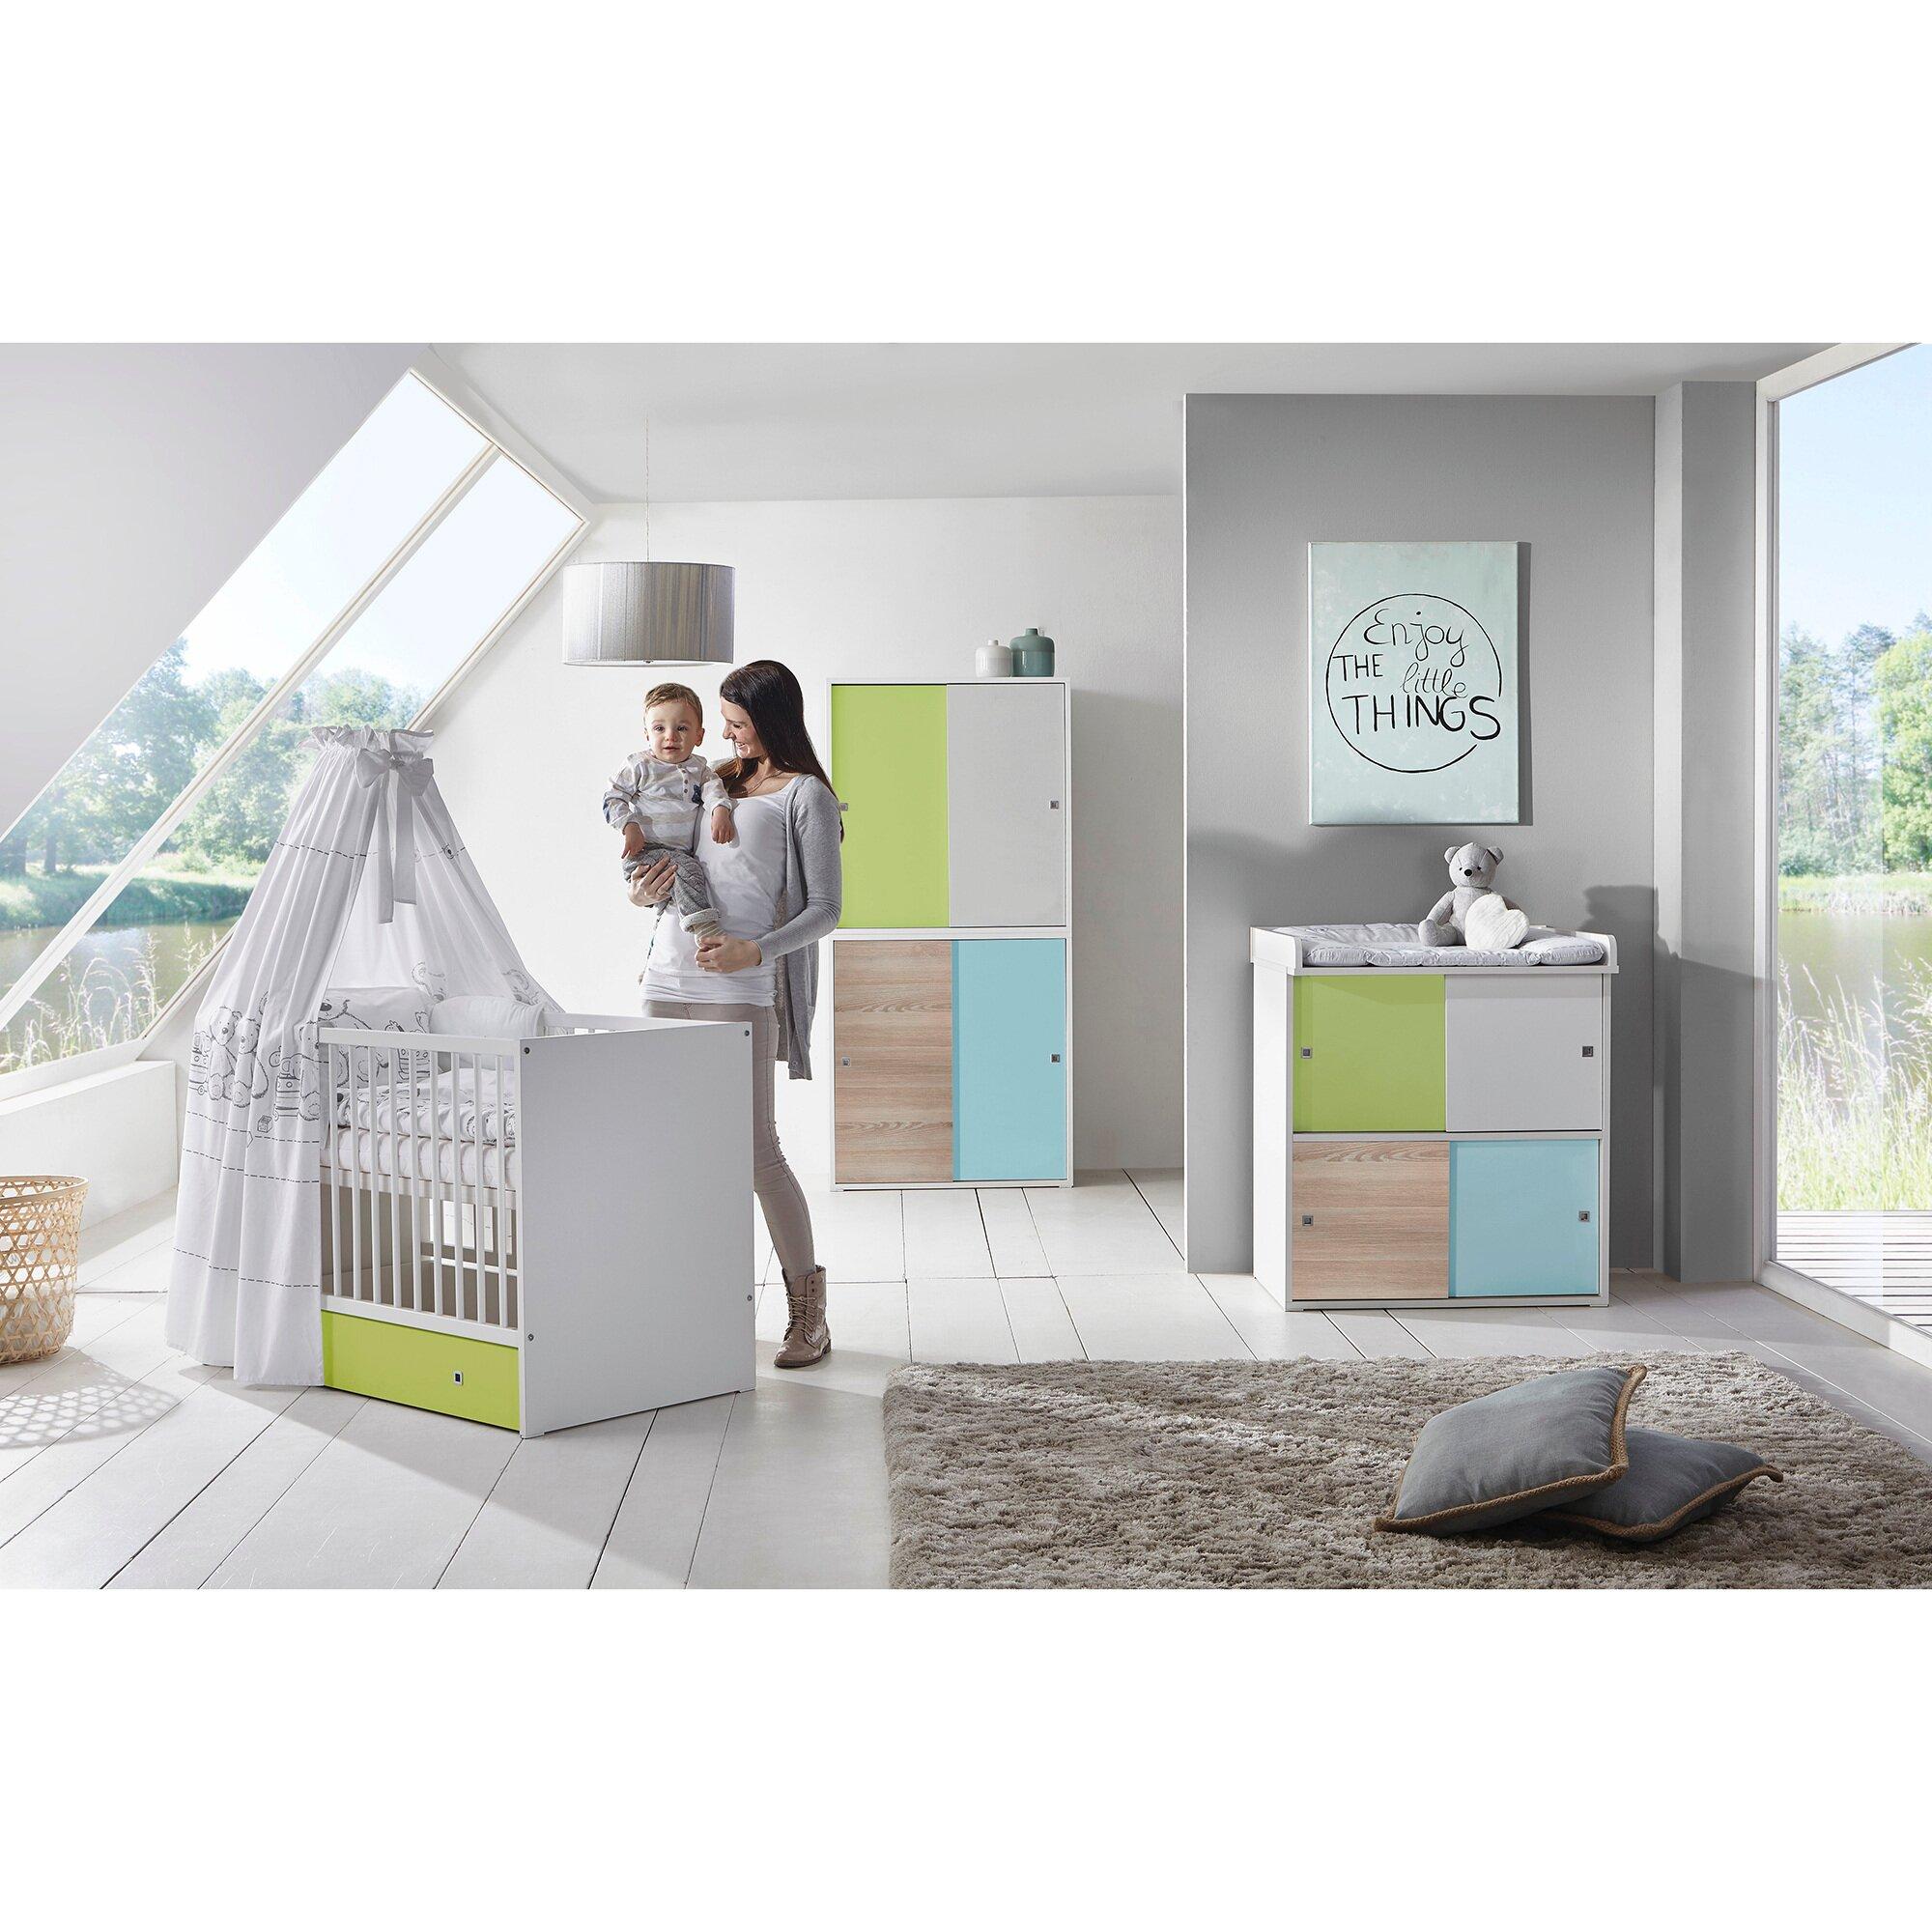 Clic Komplett-Kinderzimmer CLIC 3-tlg. (Kombi-Kinderbett, Wickelkommode, Kleiderschrank)